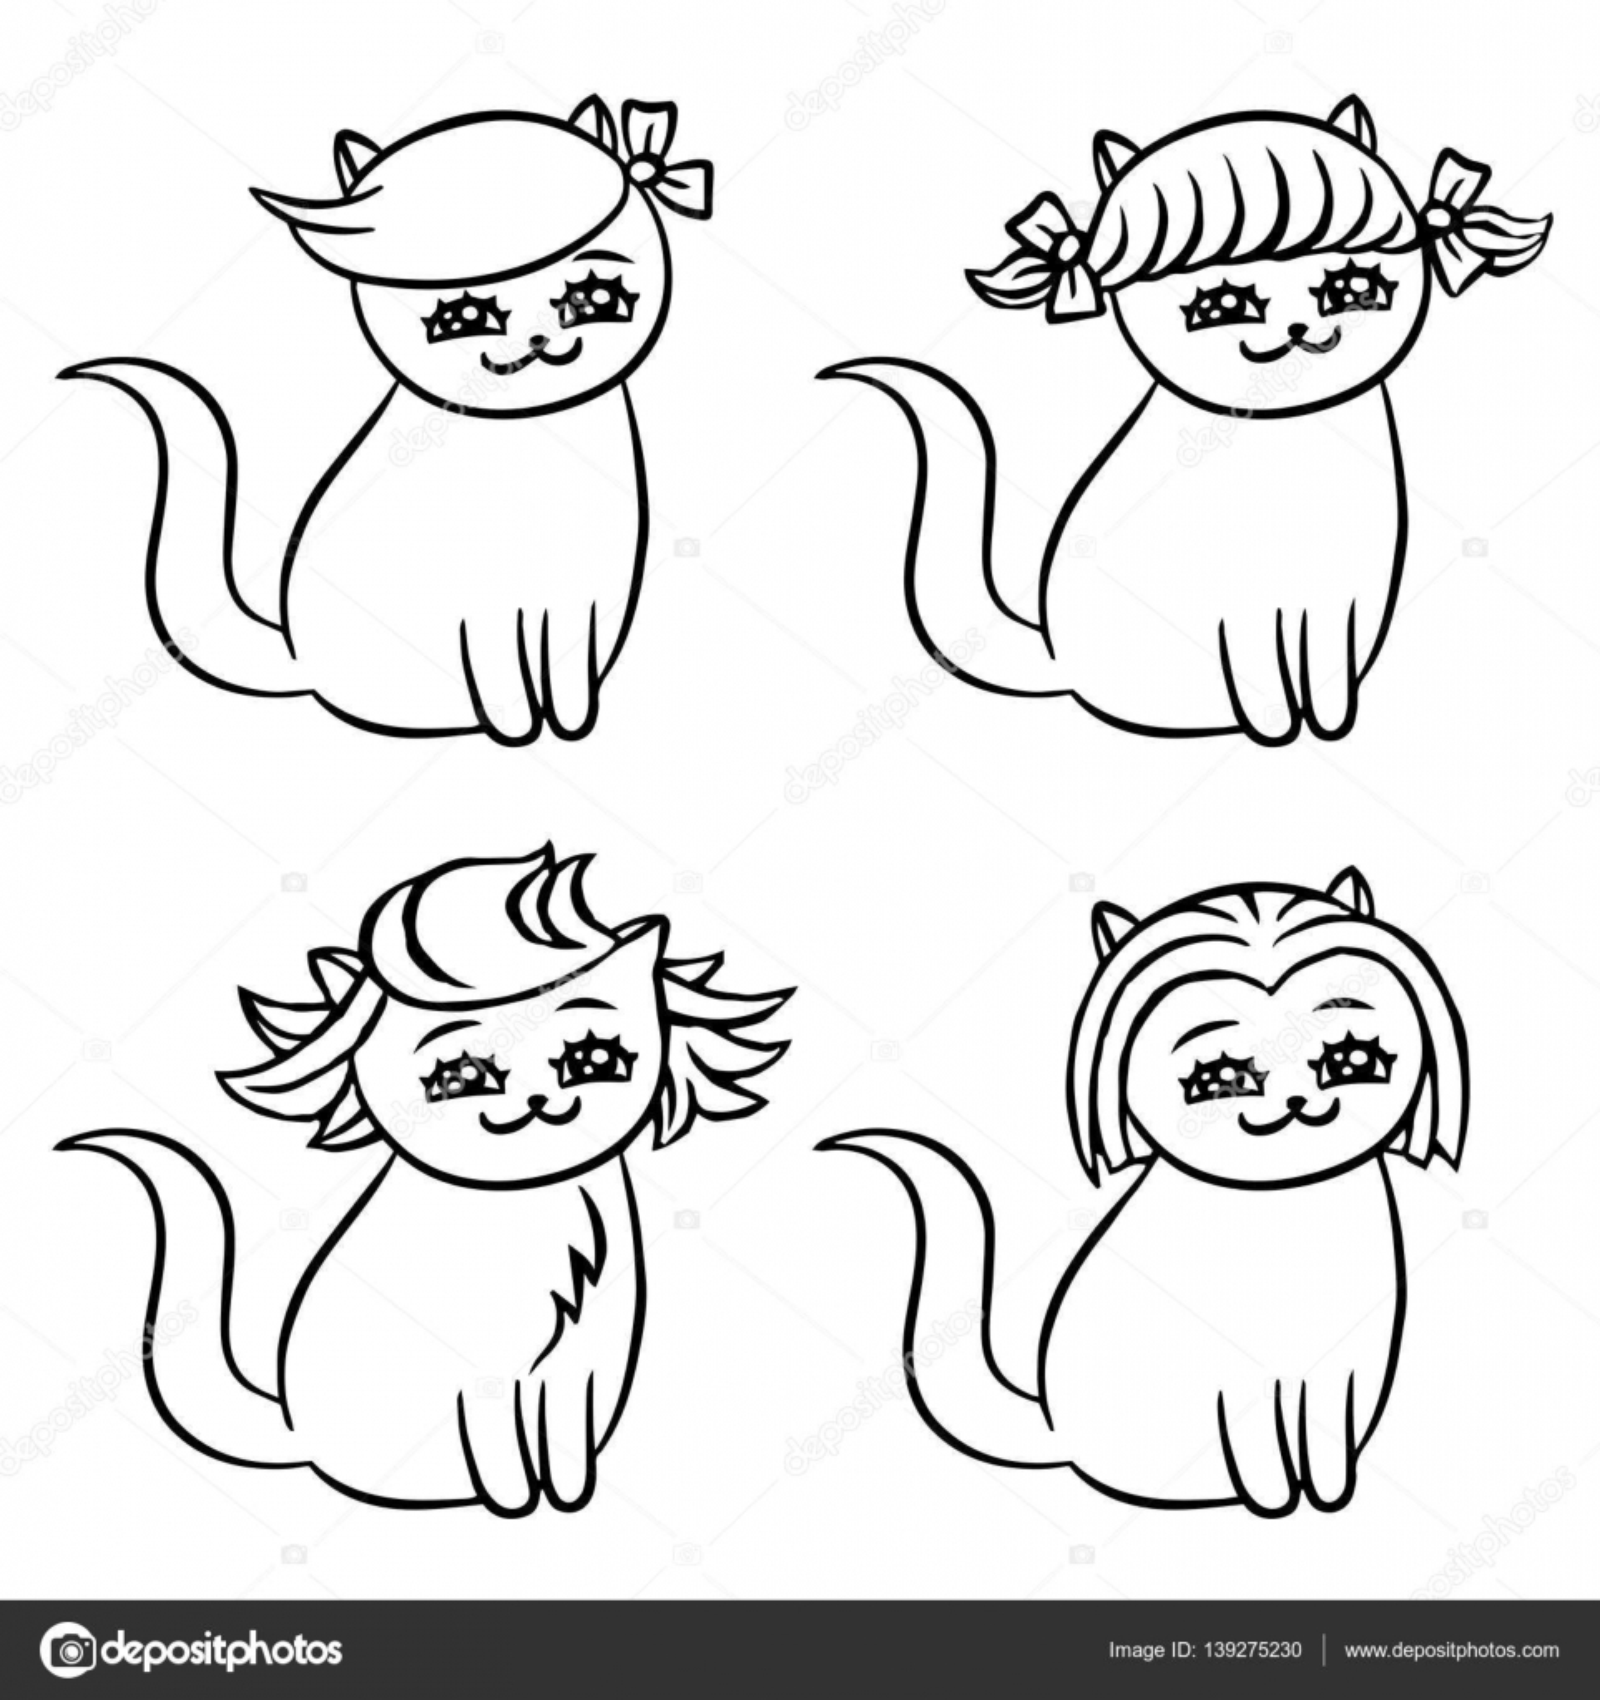 Cartoon Frisuren Katzen Vektor Illustration Stockvektor C Likozor